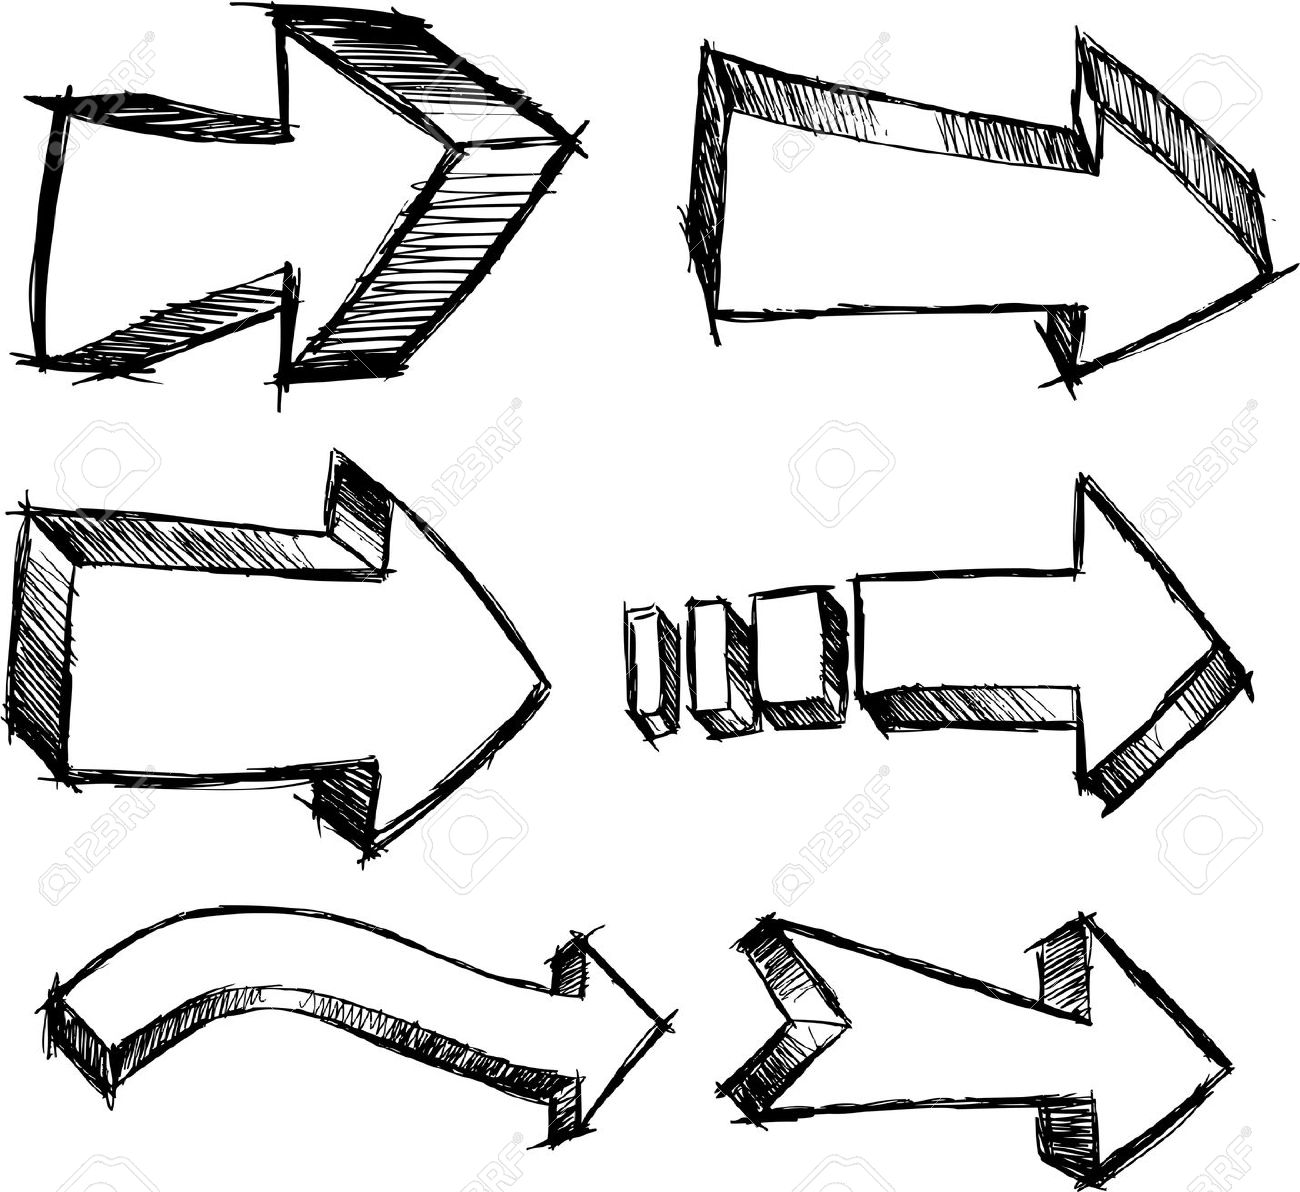 Doodle arrow clip art clipart royalty free download Doodle arrow clip art - ClipartFest clipart royalty free download